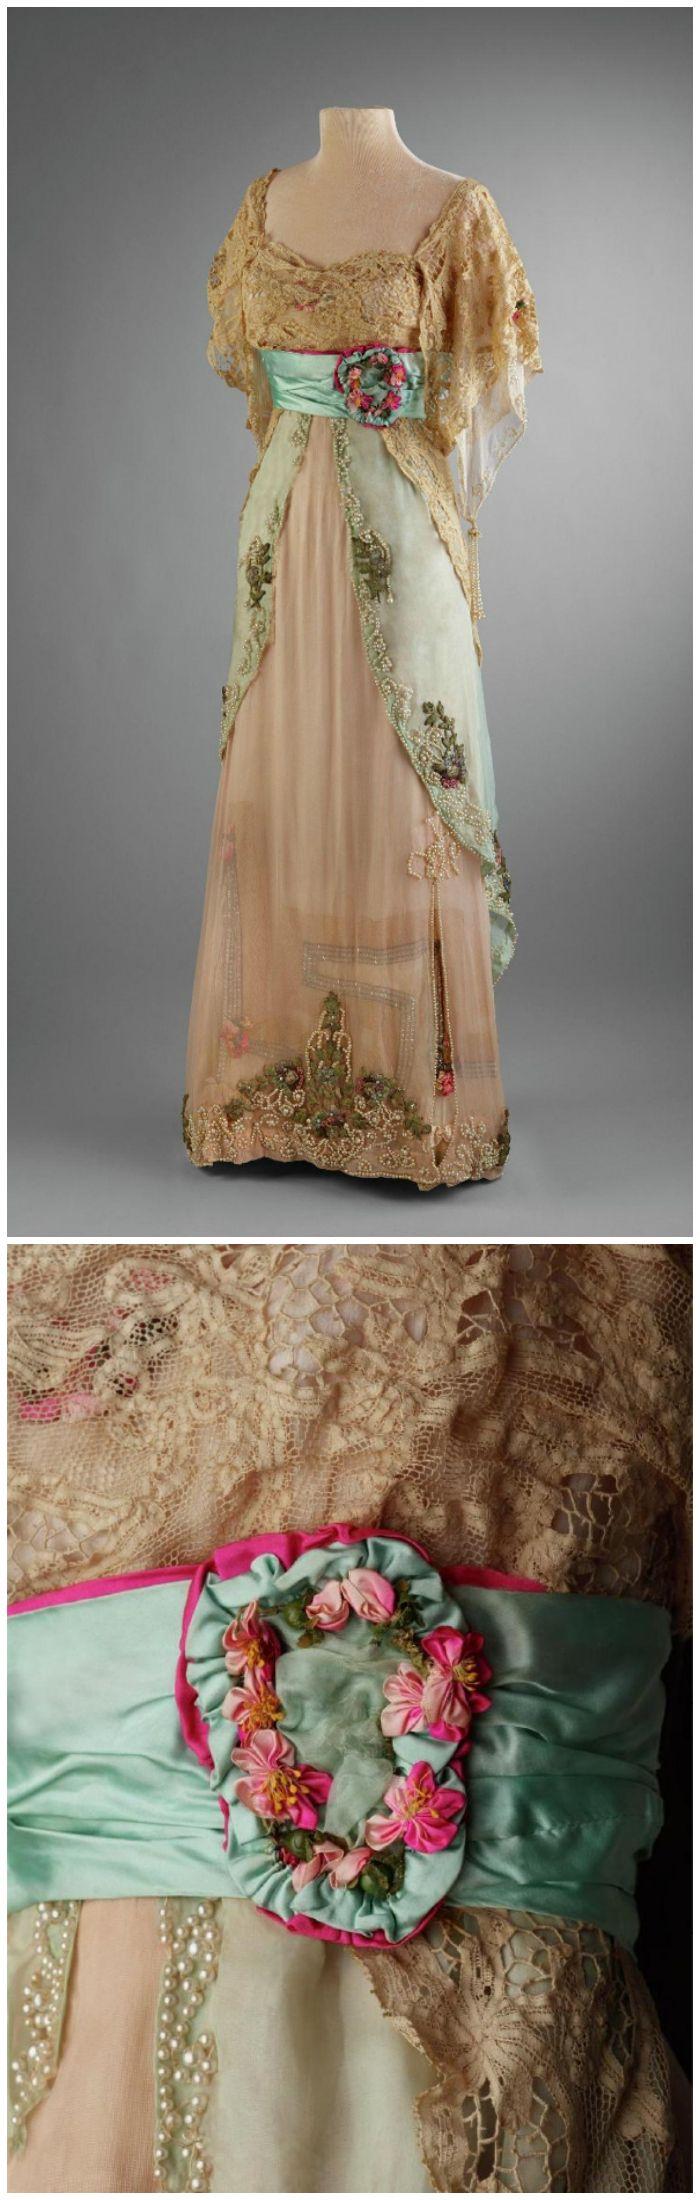 Evening dress, by Widoff, New York, 1911-13, Hillwood Estate, Museum ...